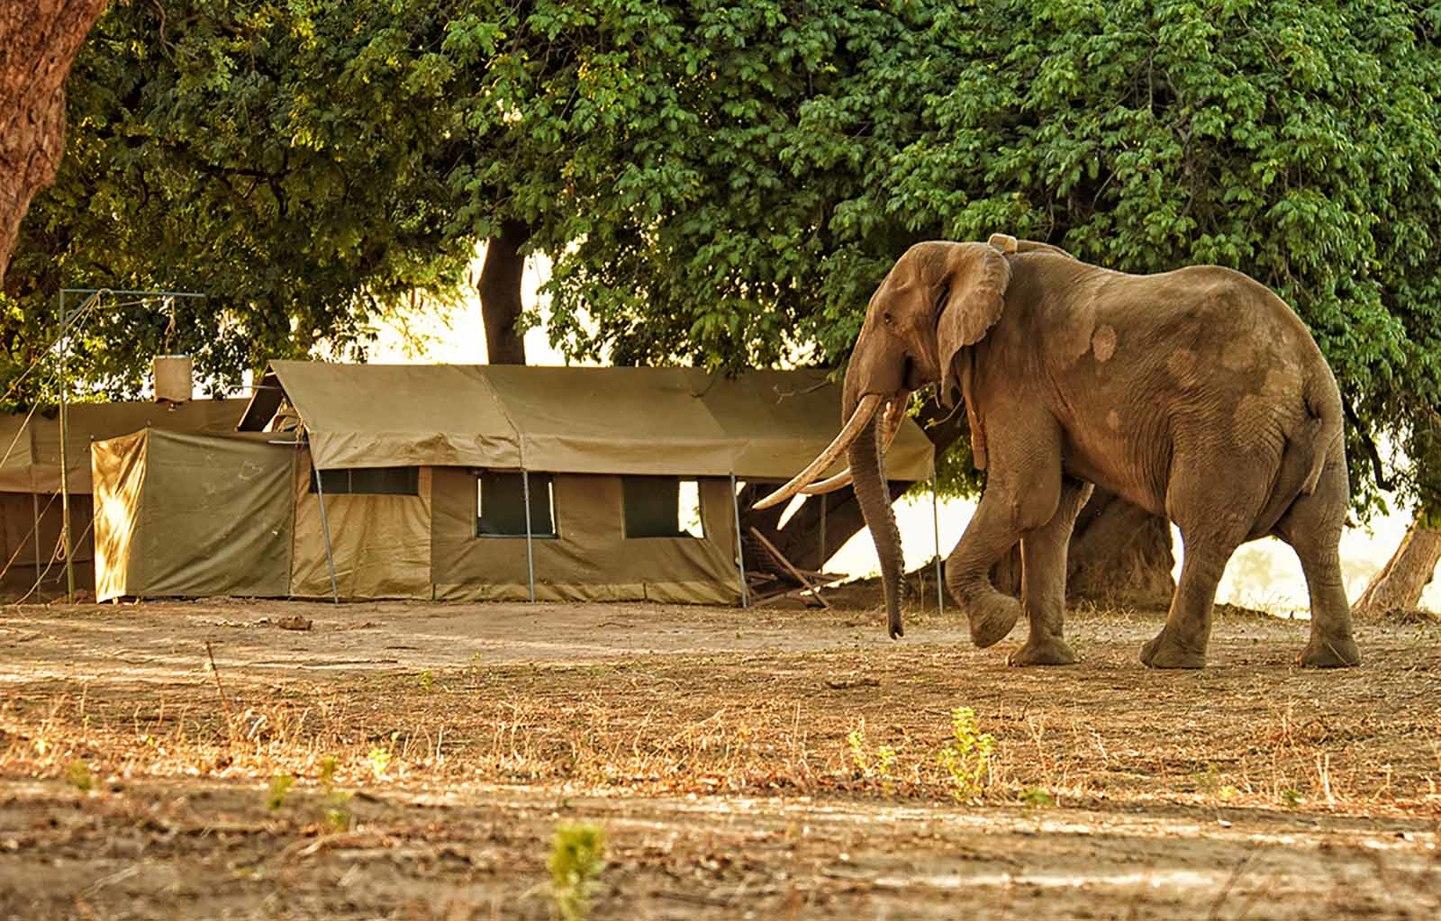 Zimbawe y Botswana: Tras los pasos de Livingstone